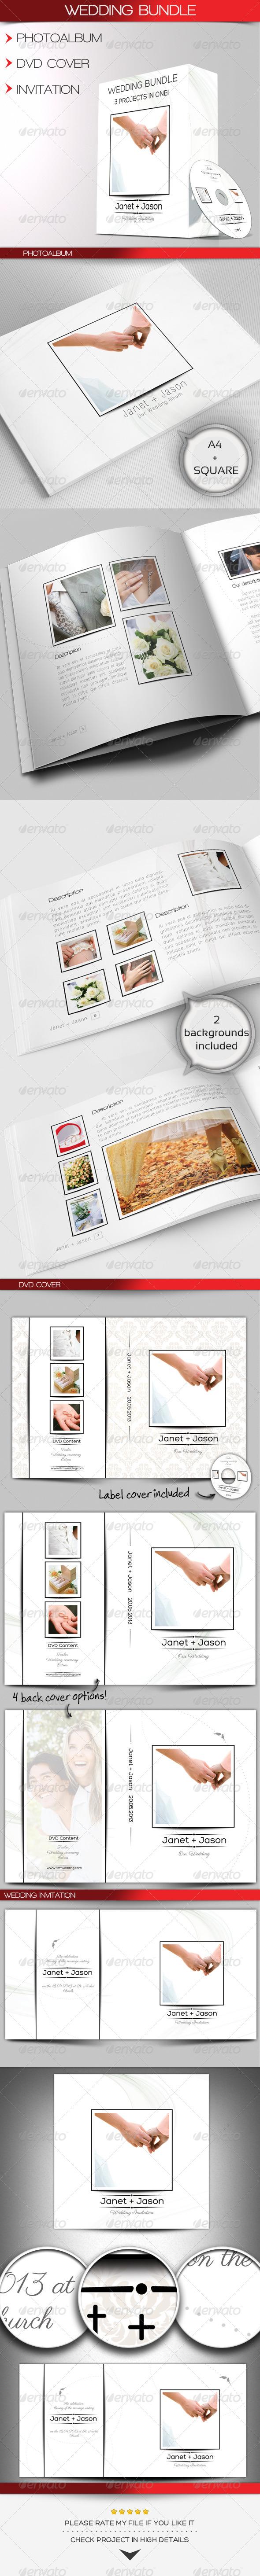 Wedding Bundle - Print Templates